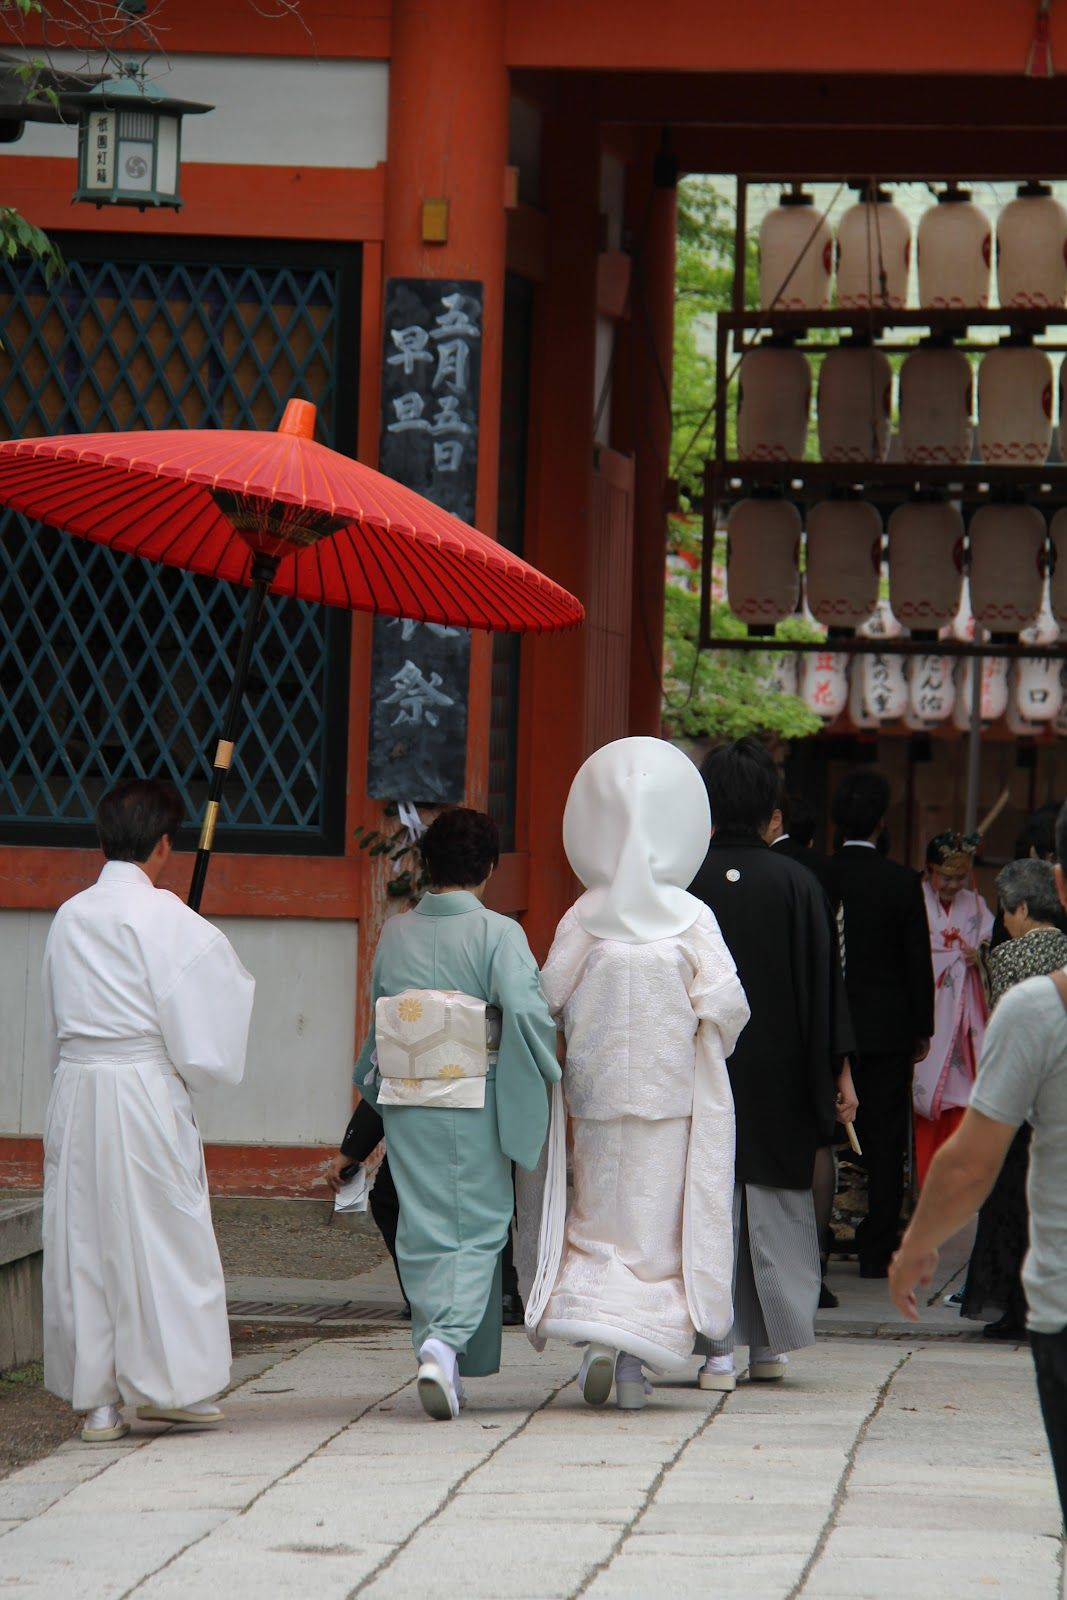 EATspeak: Izuju (Kyoto style sushi), a Sumie exhibition and Gion stroll...